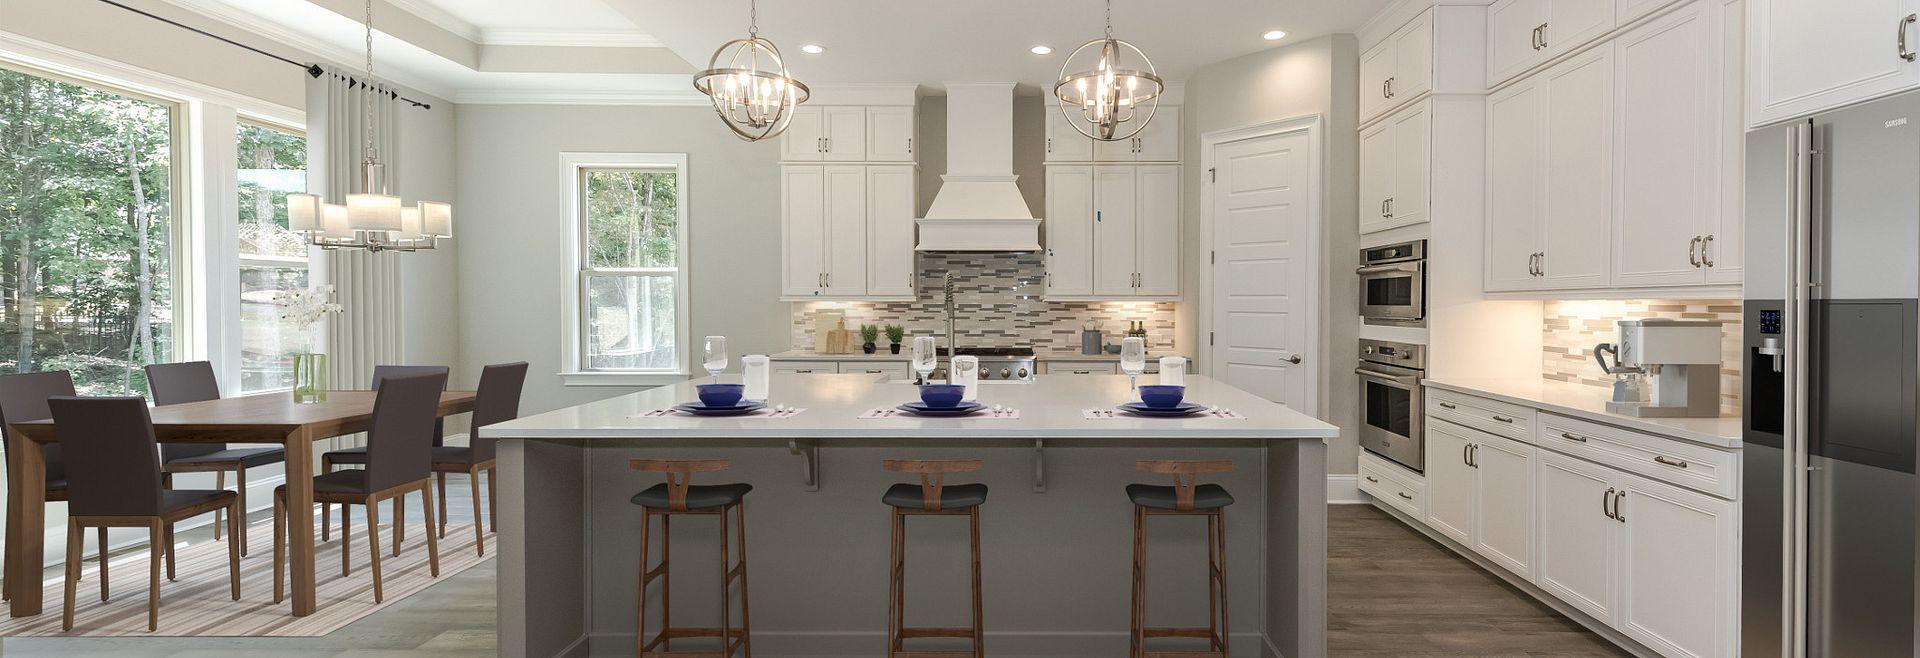 Avalon Kitchen with custom island